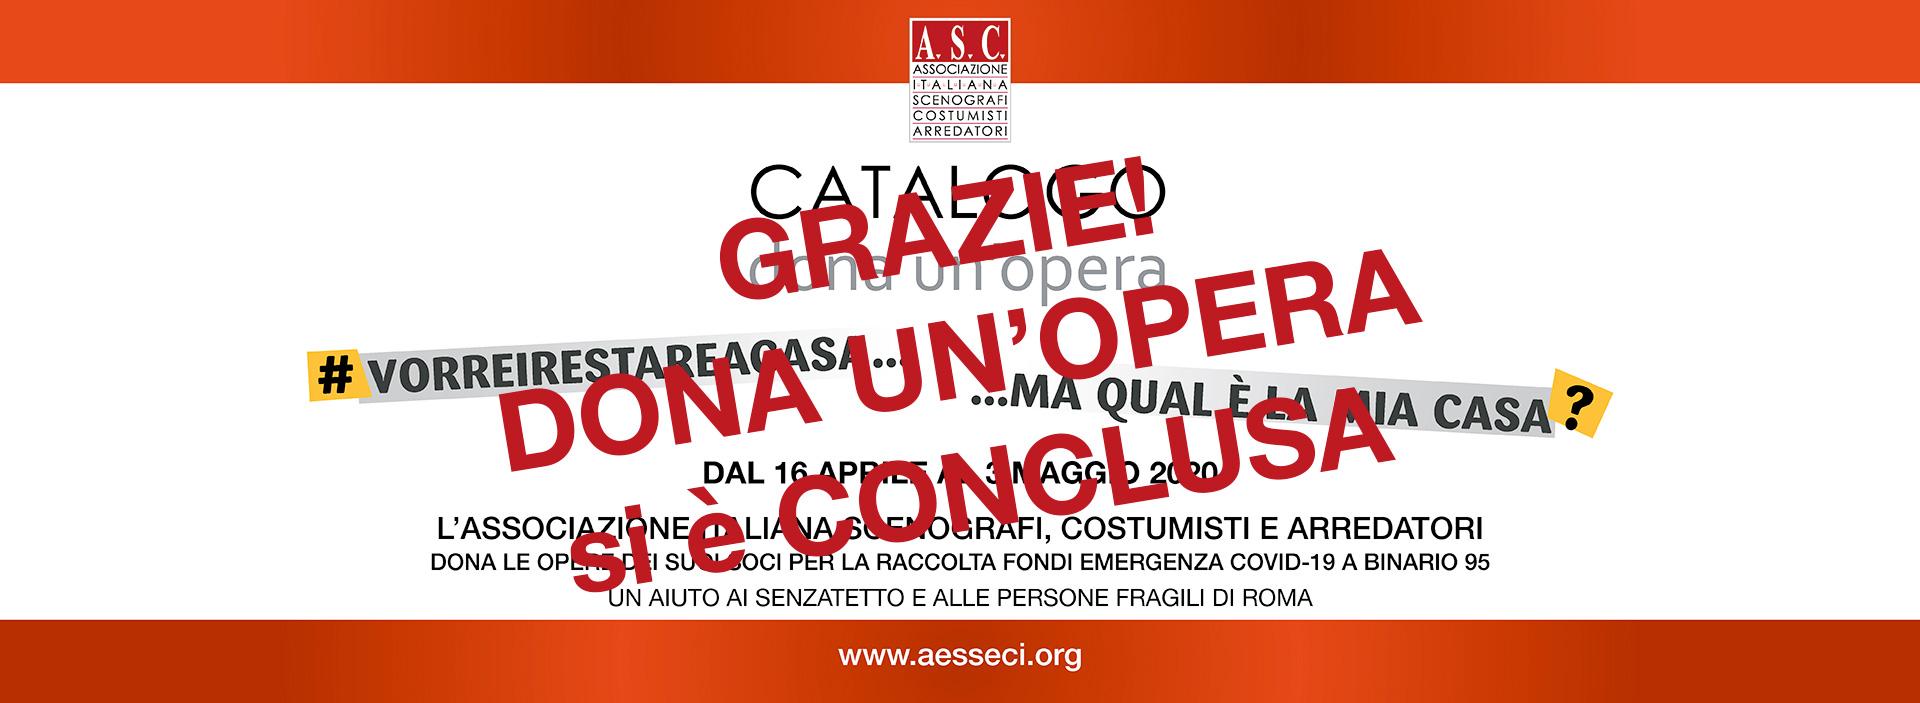 slide_catalogodonaunopera_conclusa